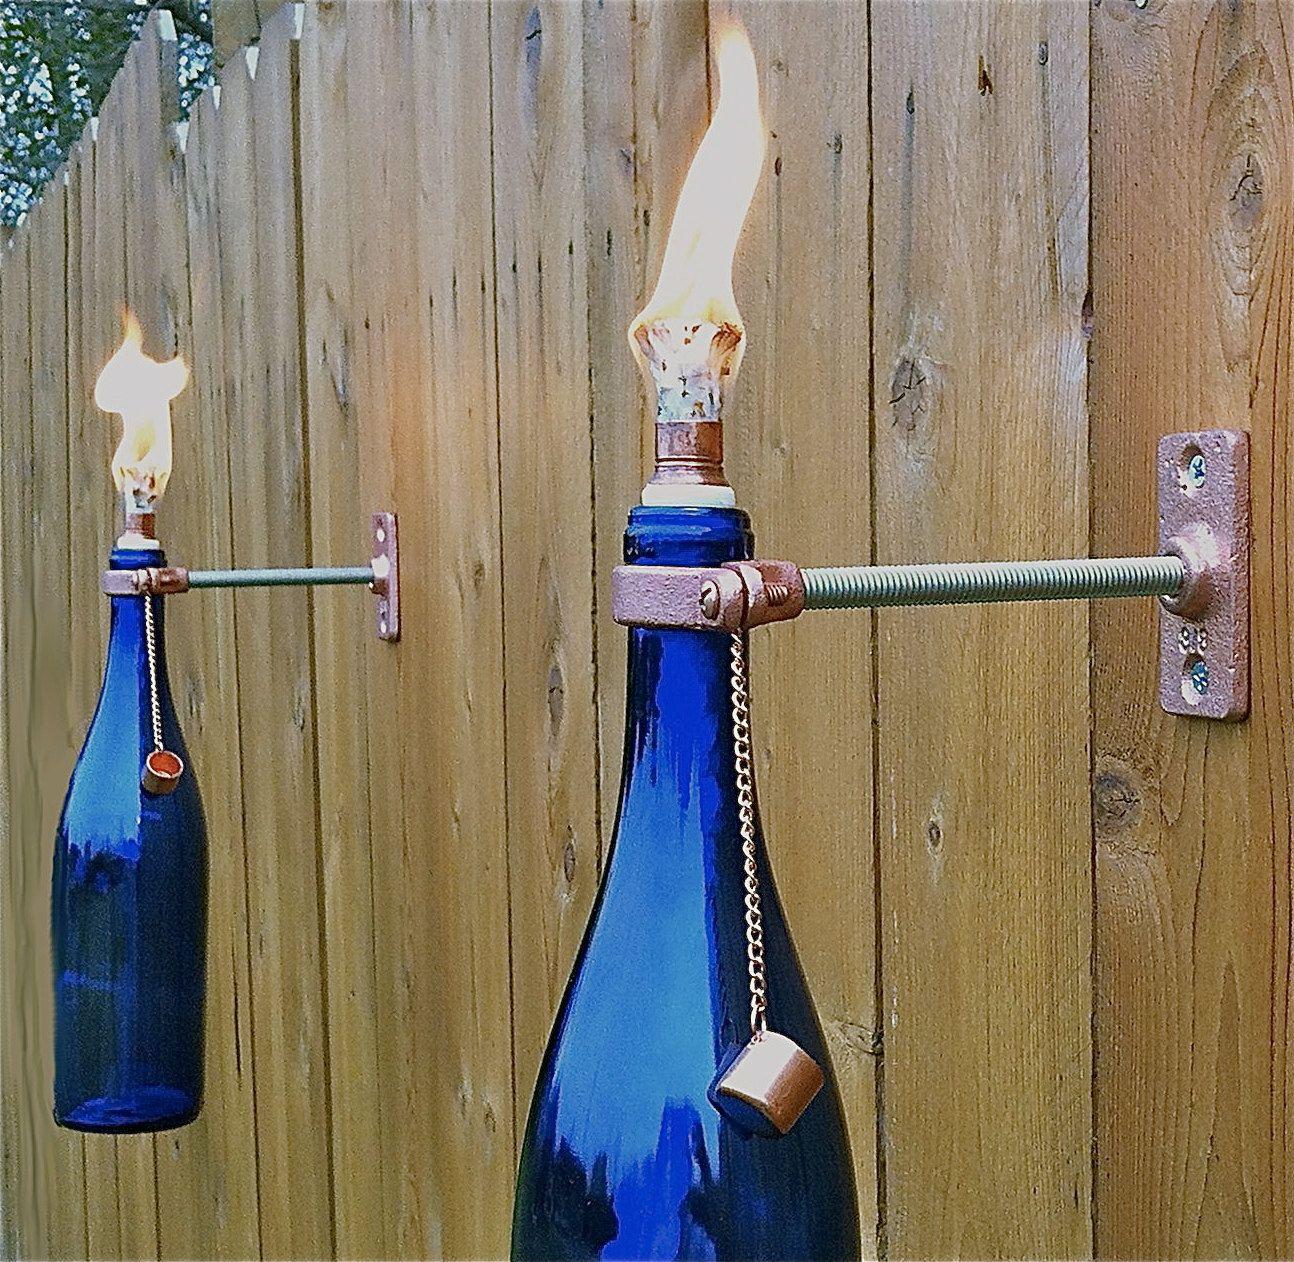 lighting tiki torches. cobalt blue wine bottle tiki torches will add stylish lighting to your outdoor space mount f